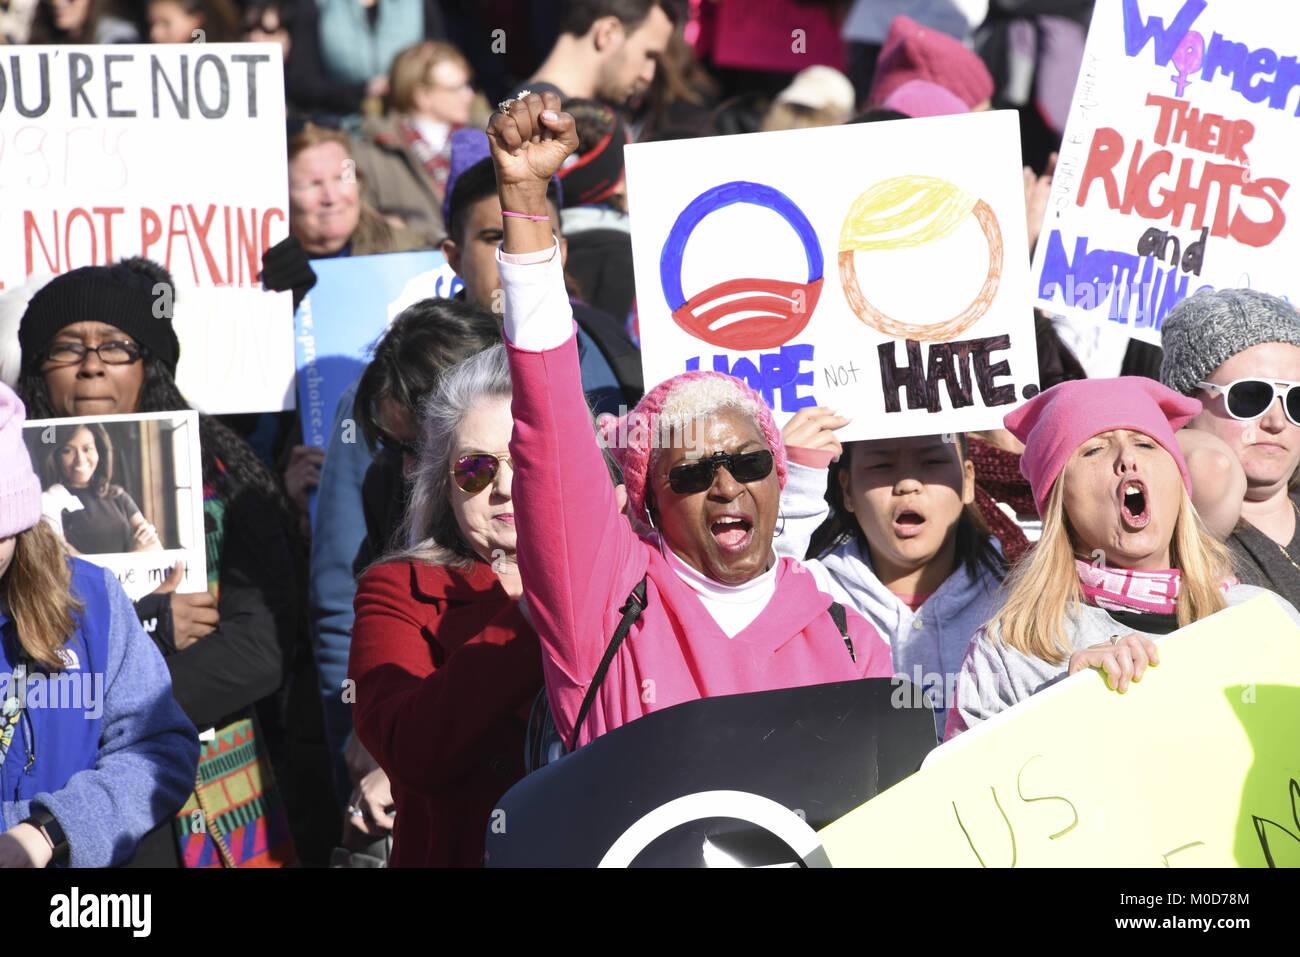 Washington Dc, USA. 20th Jan, 2018. Teena Crenshaw of Martinsville, Virginia raises a fist following a speech at - Stock Image